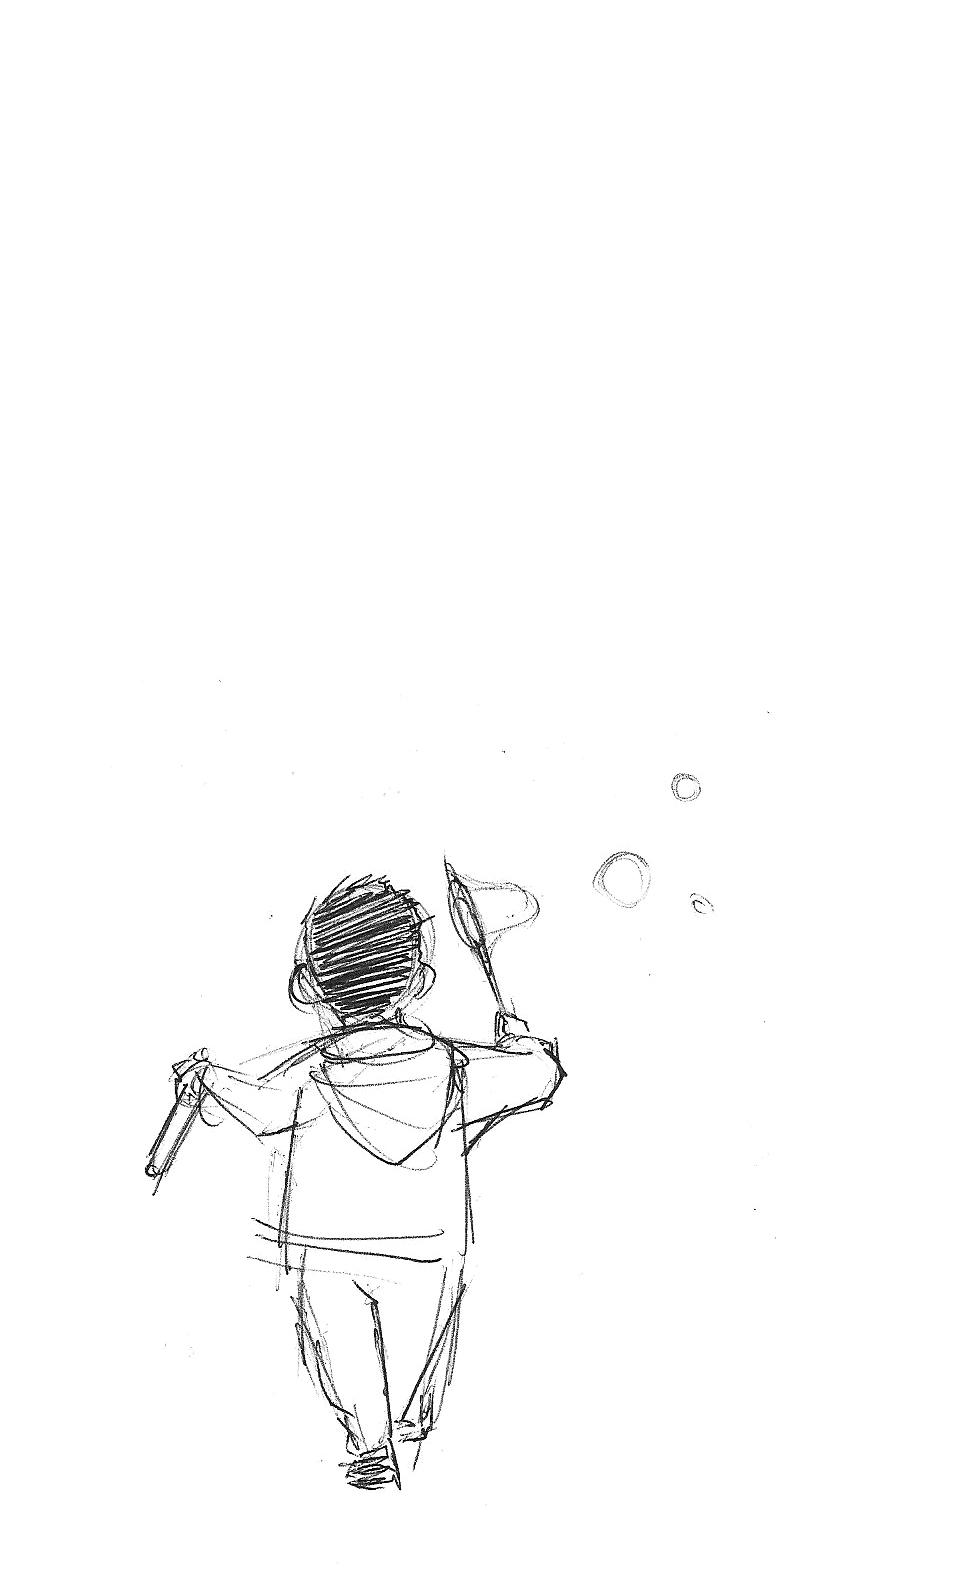 Fa Yuen sketches (1) - 2.jpg